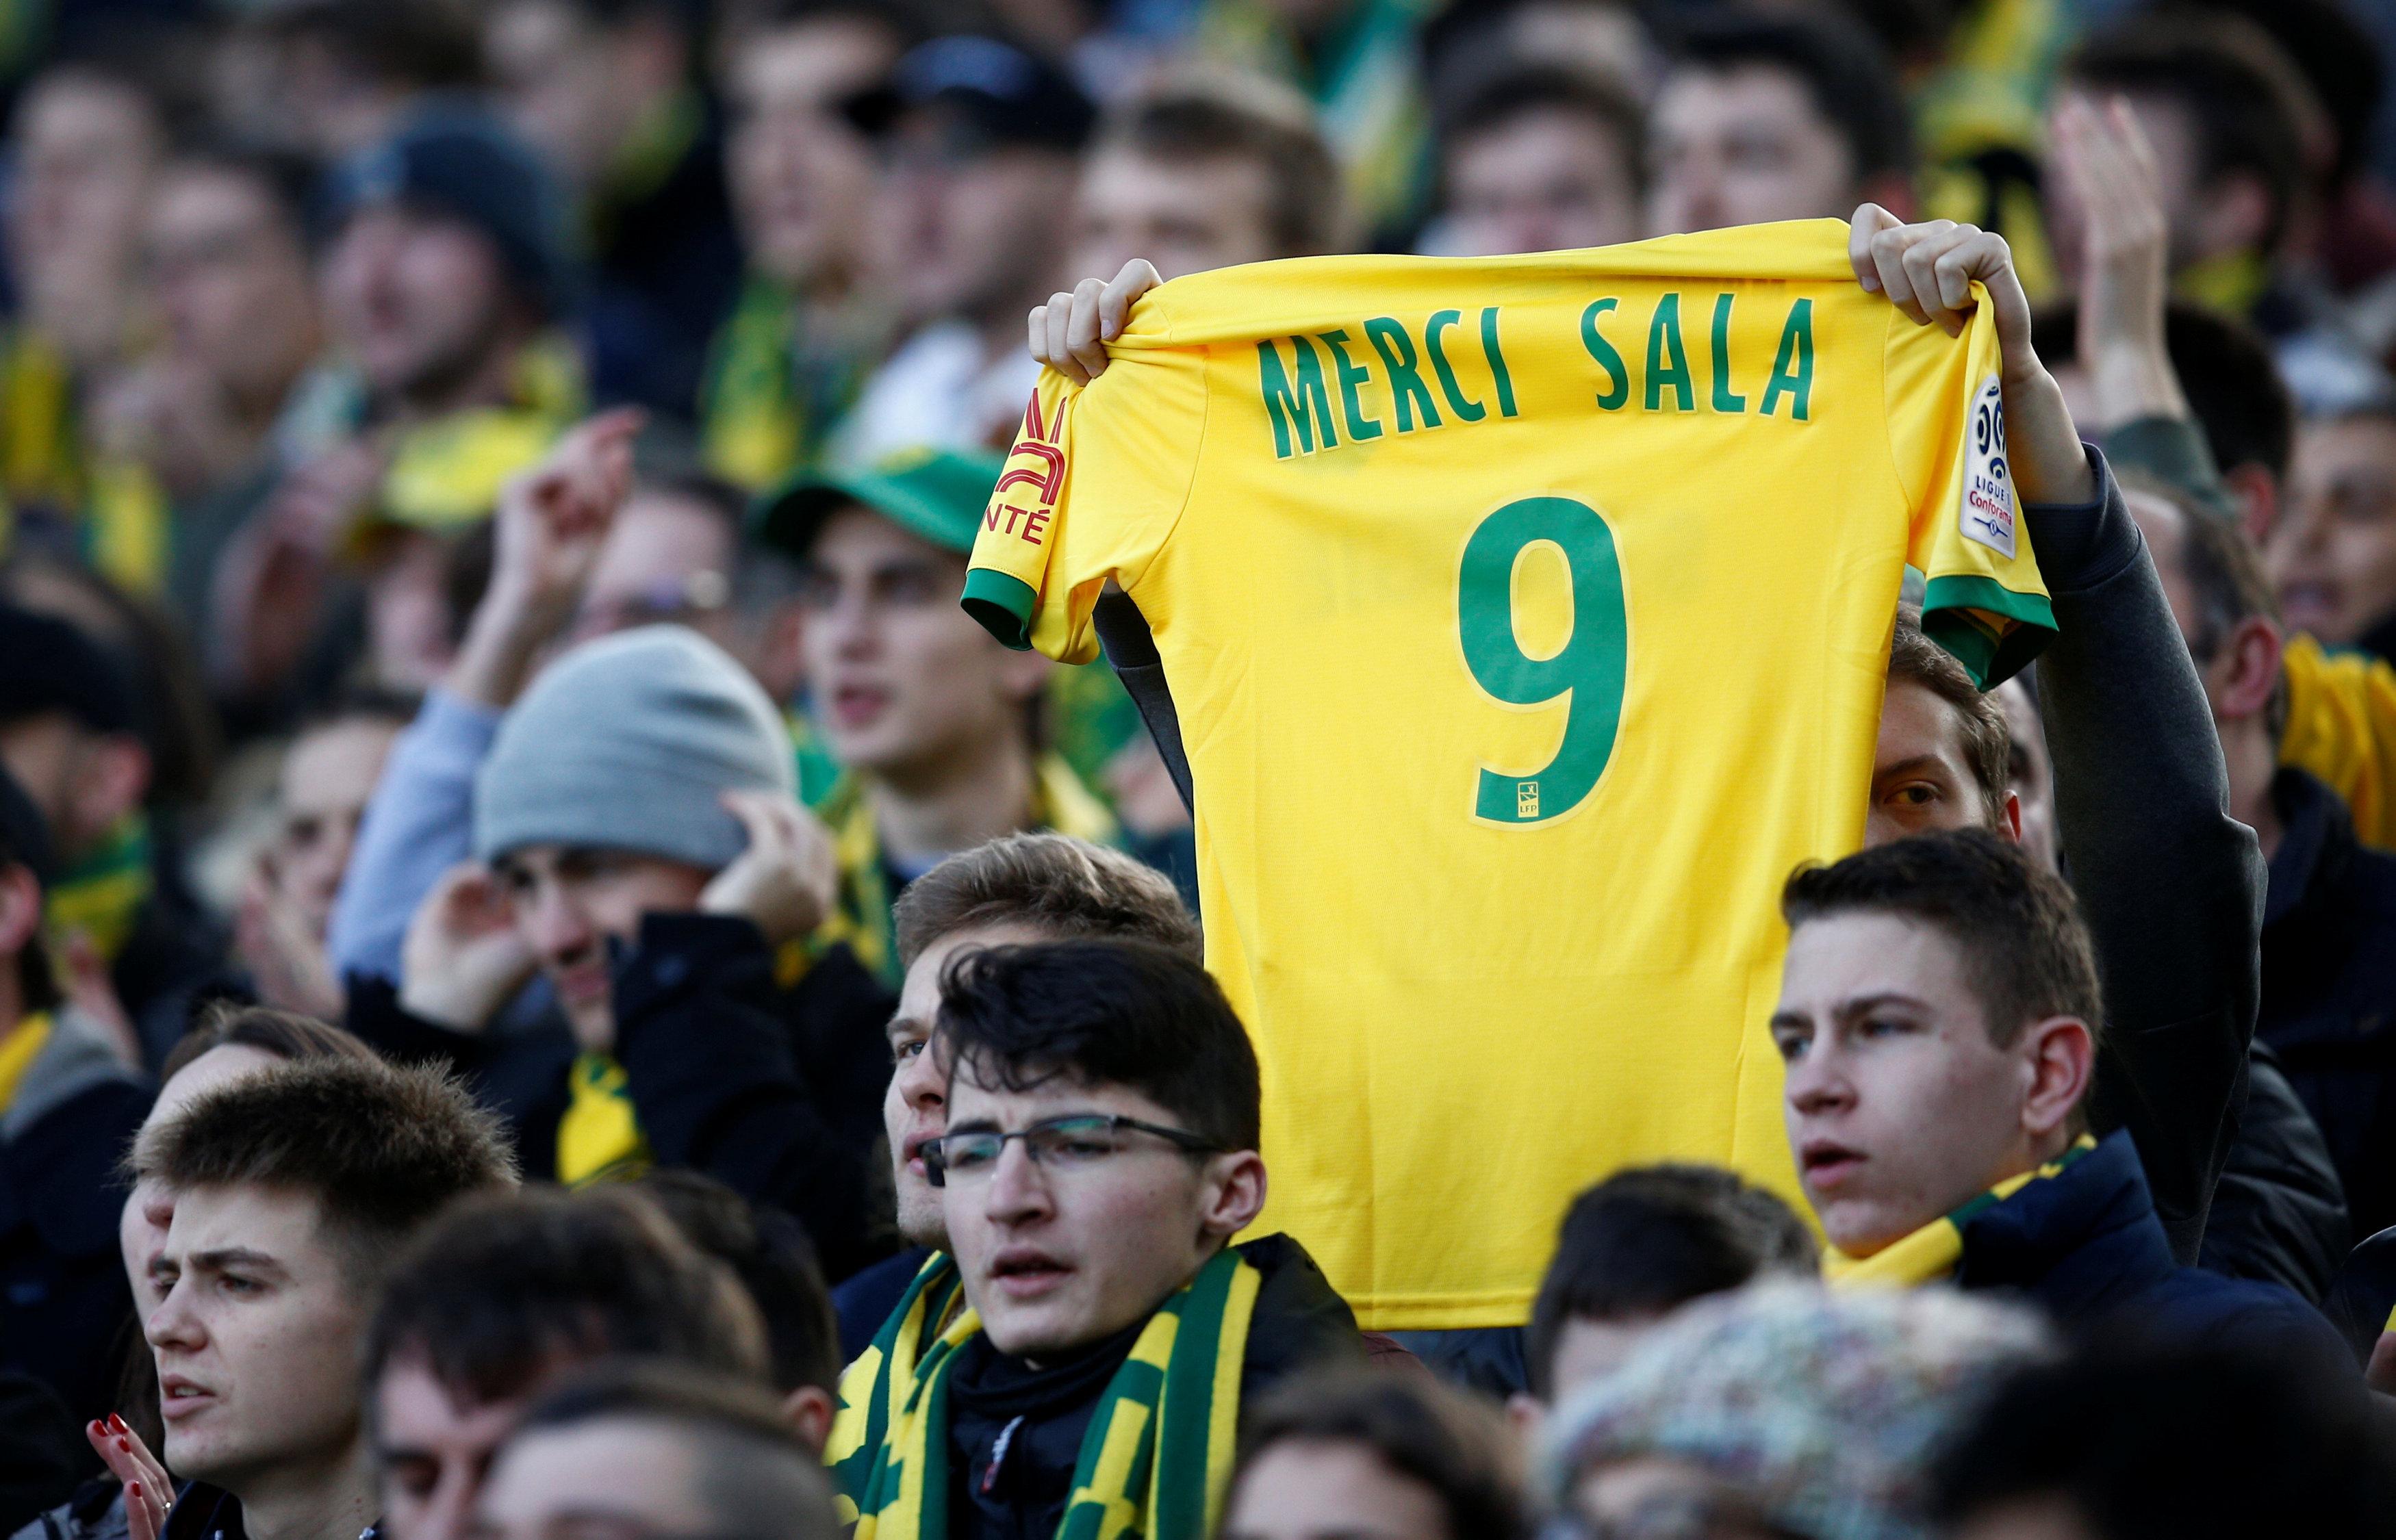 Football - Transferts - Disparition d'Emiliano Sala: Cardiff veut annuler le transfert